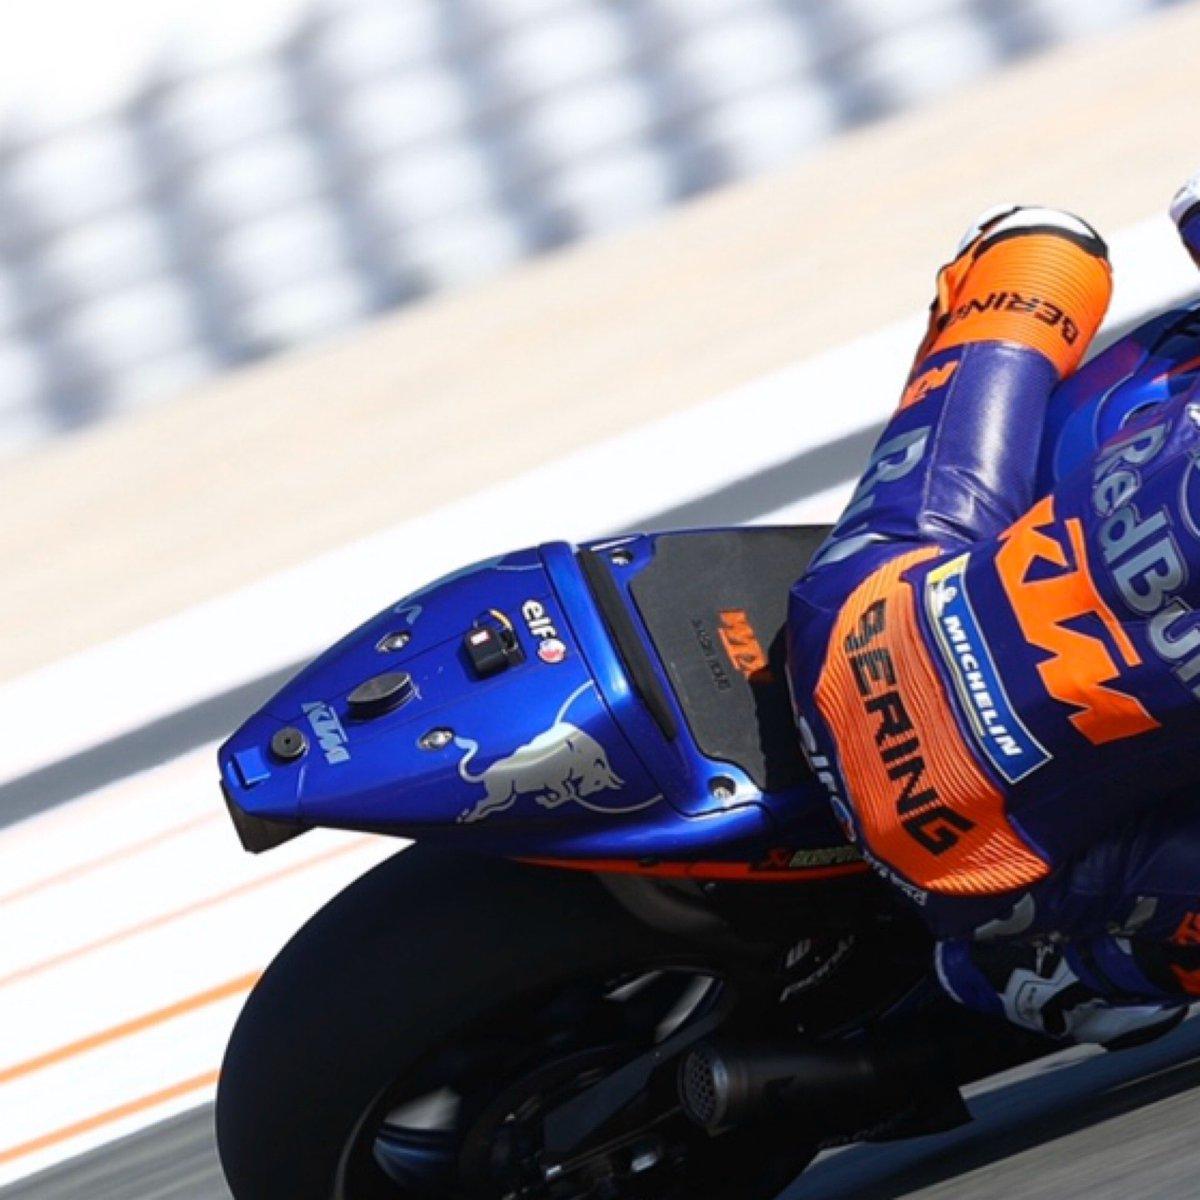 Have a rapid start into the new week ✊🏻😉 #KTM #Tech3 #MotoGP @MotoGP #IL27